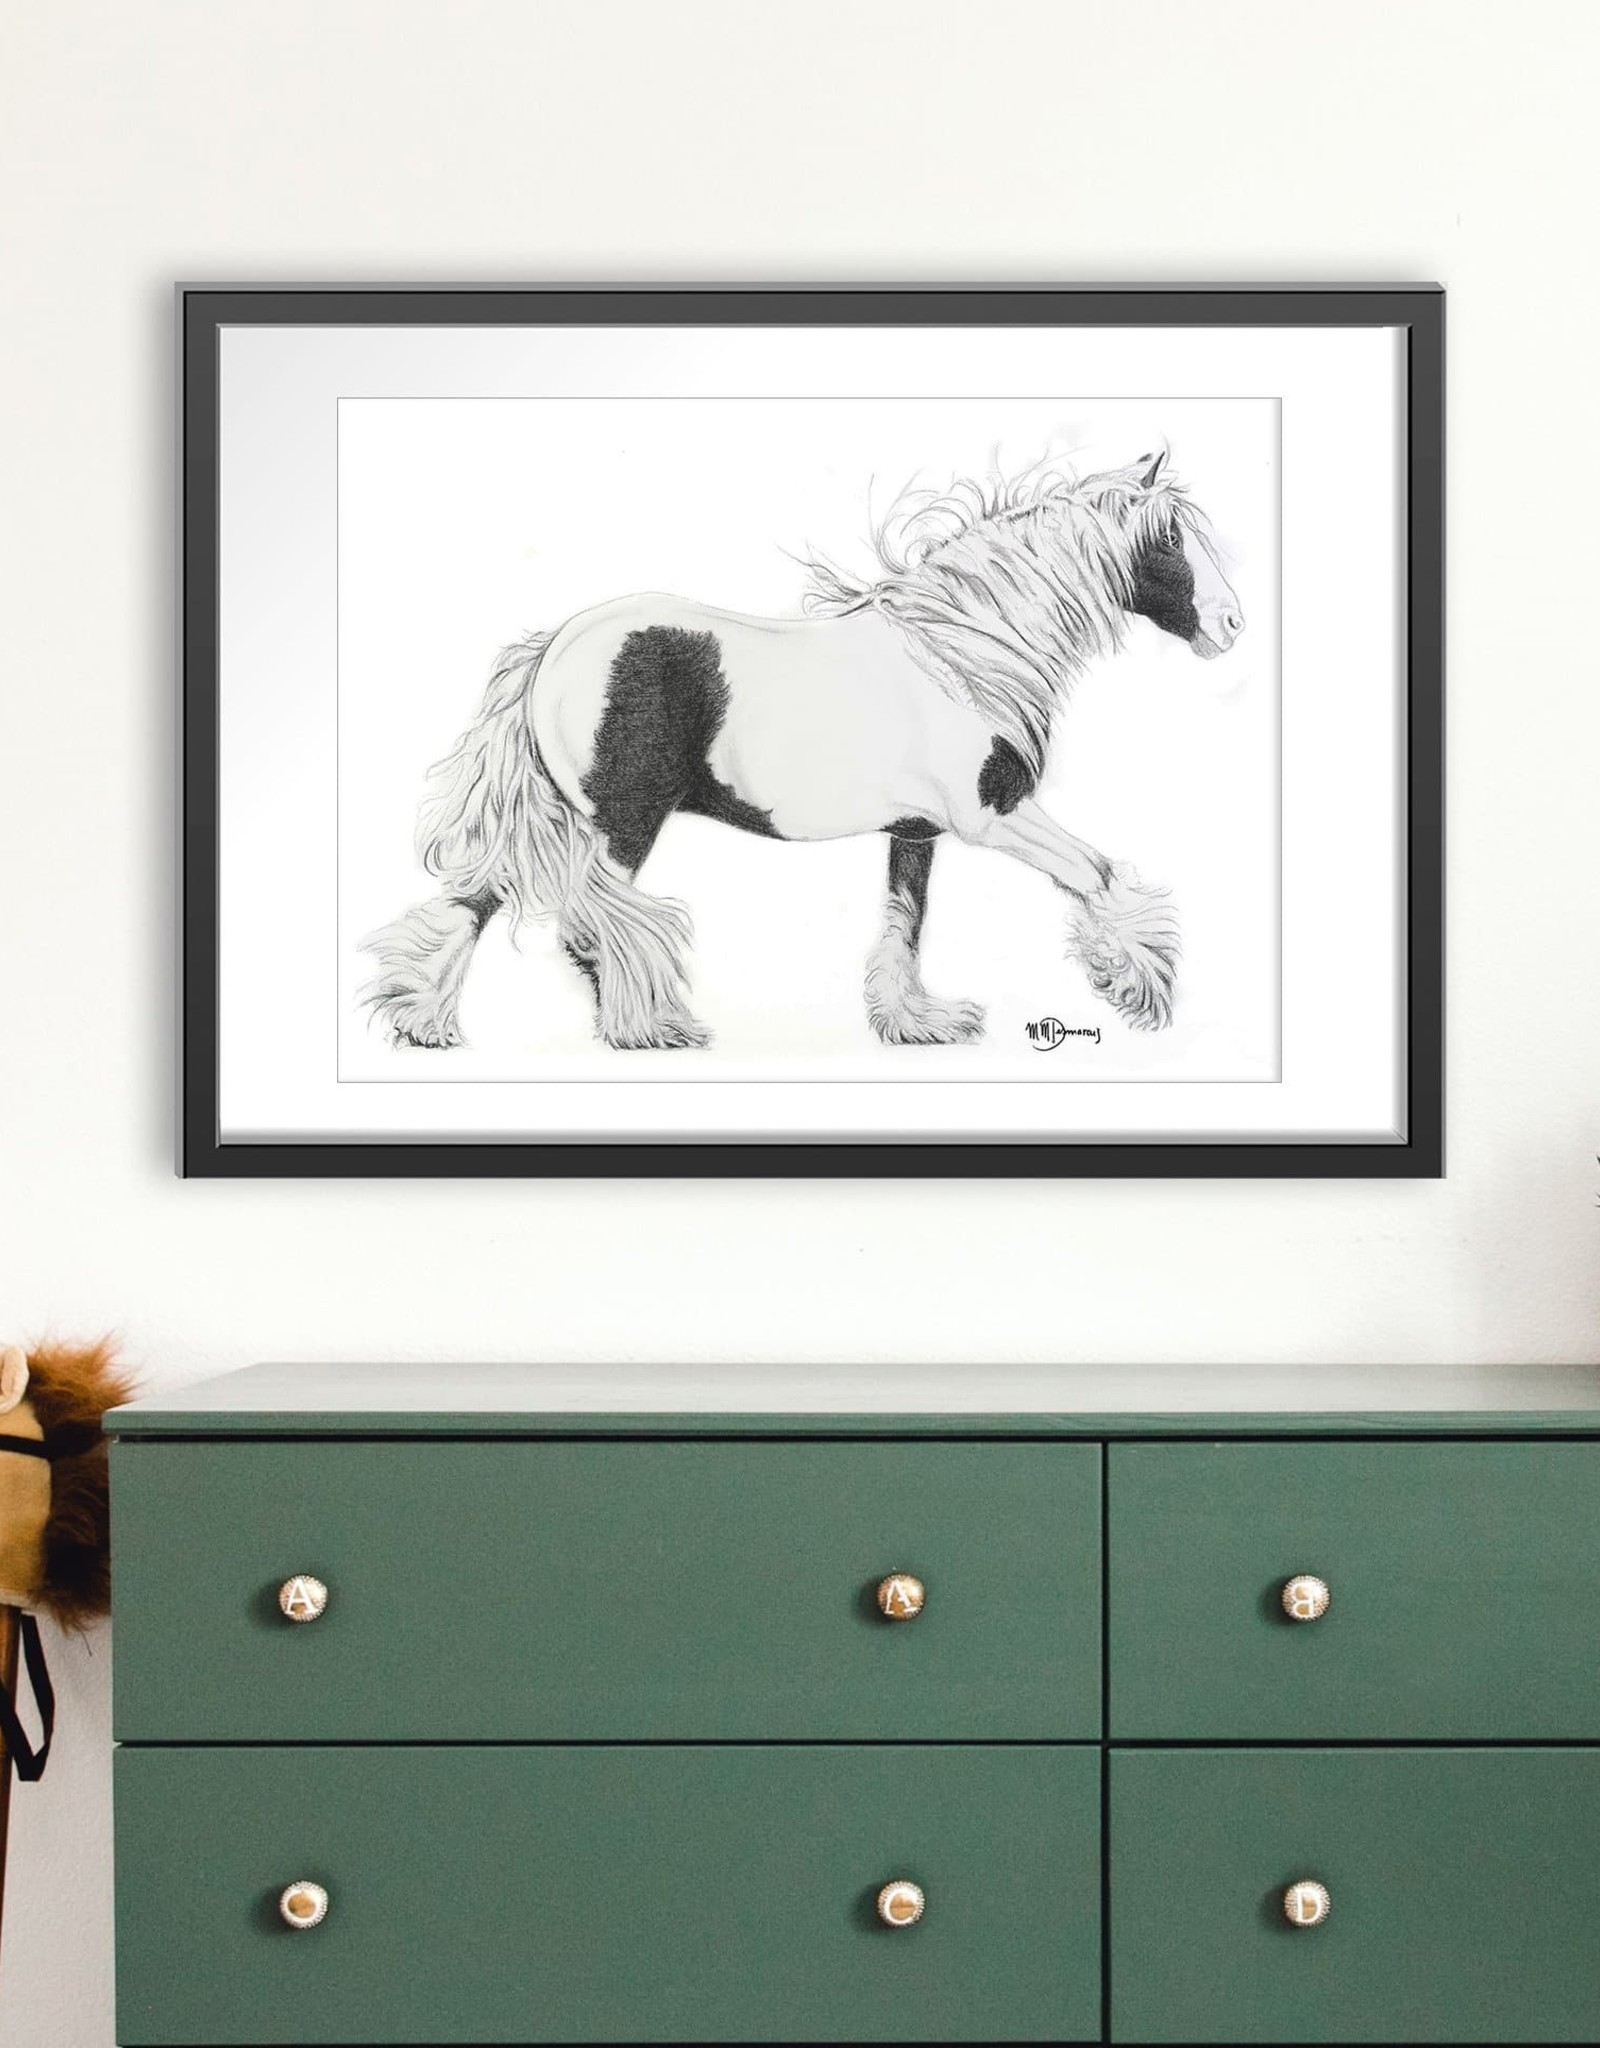 Le Nid atelier Illustration 12x18 - Cheval gitan